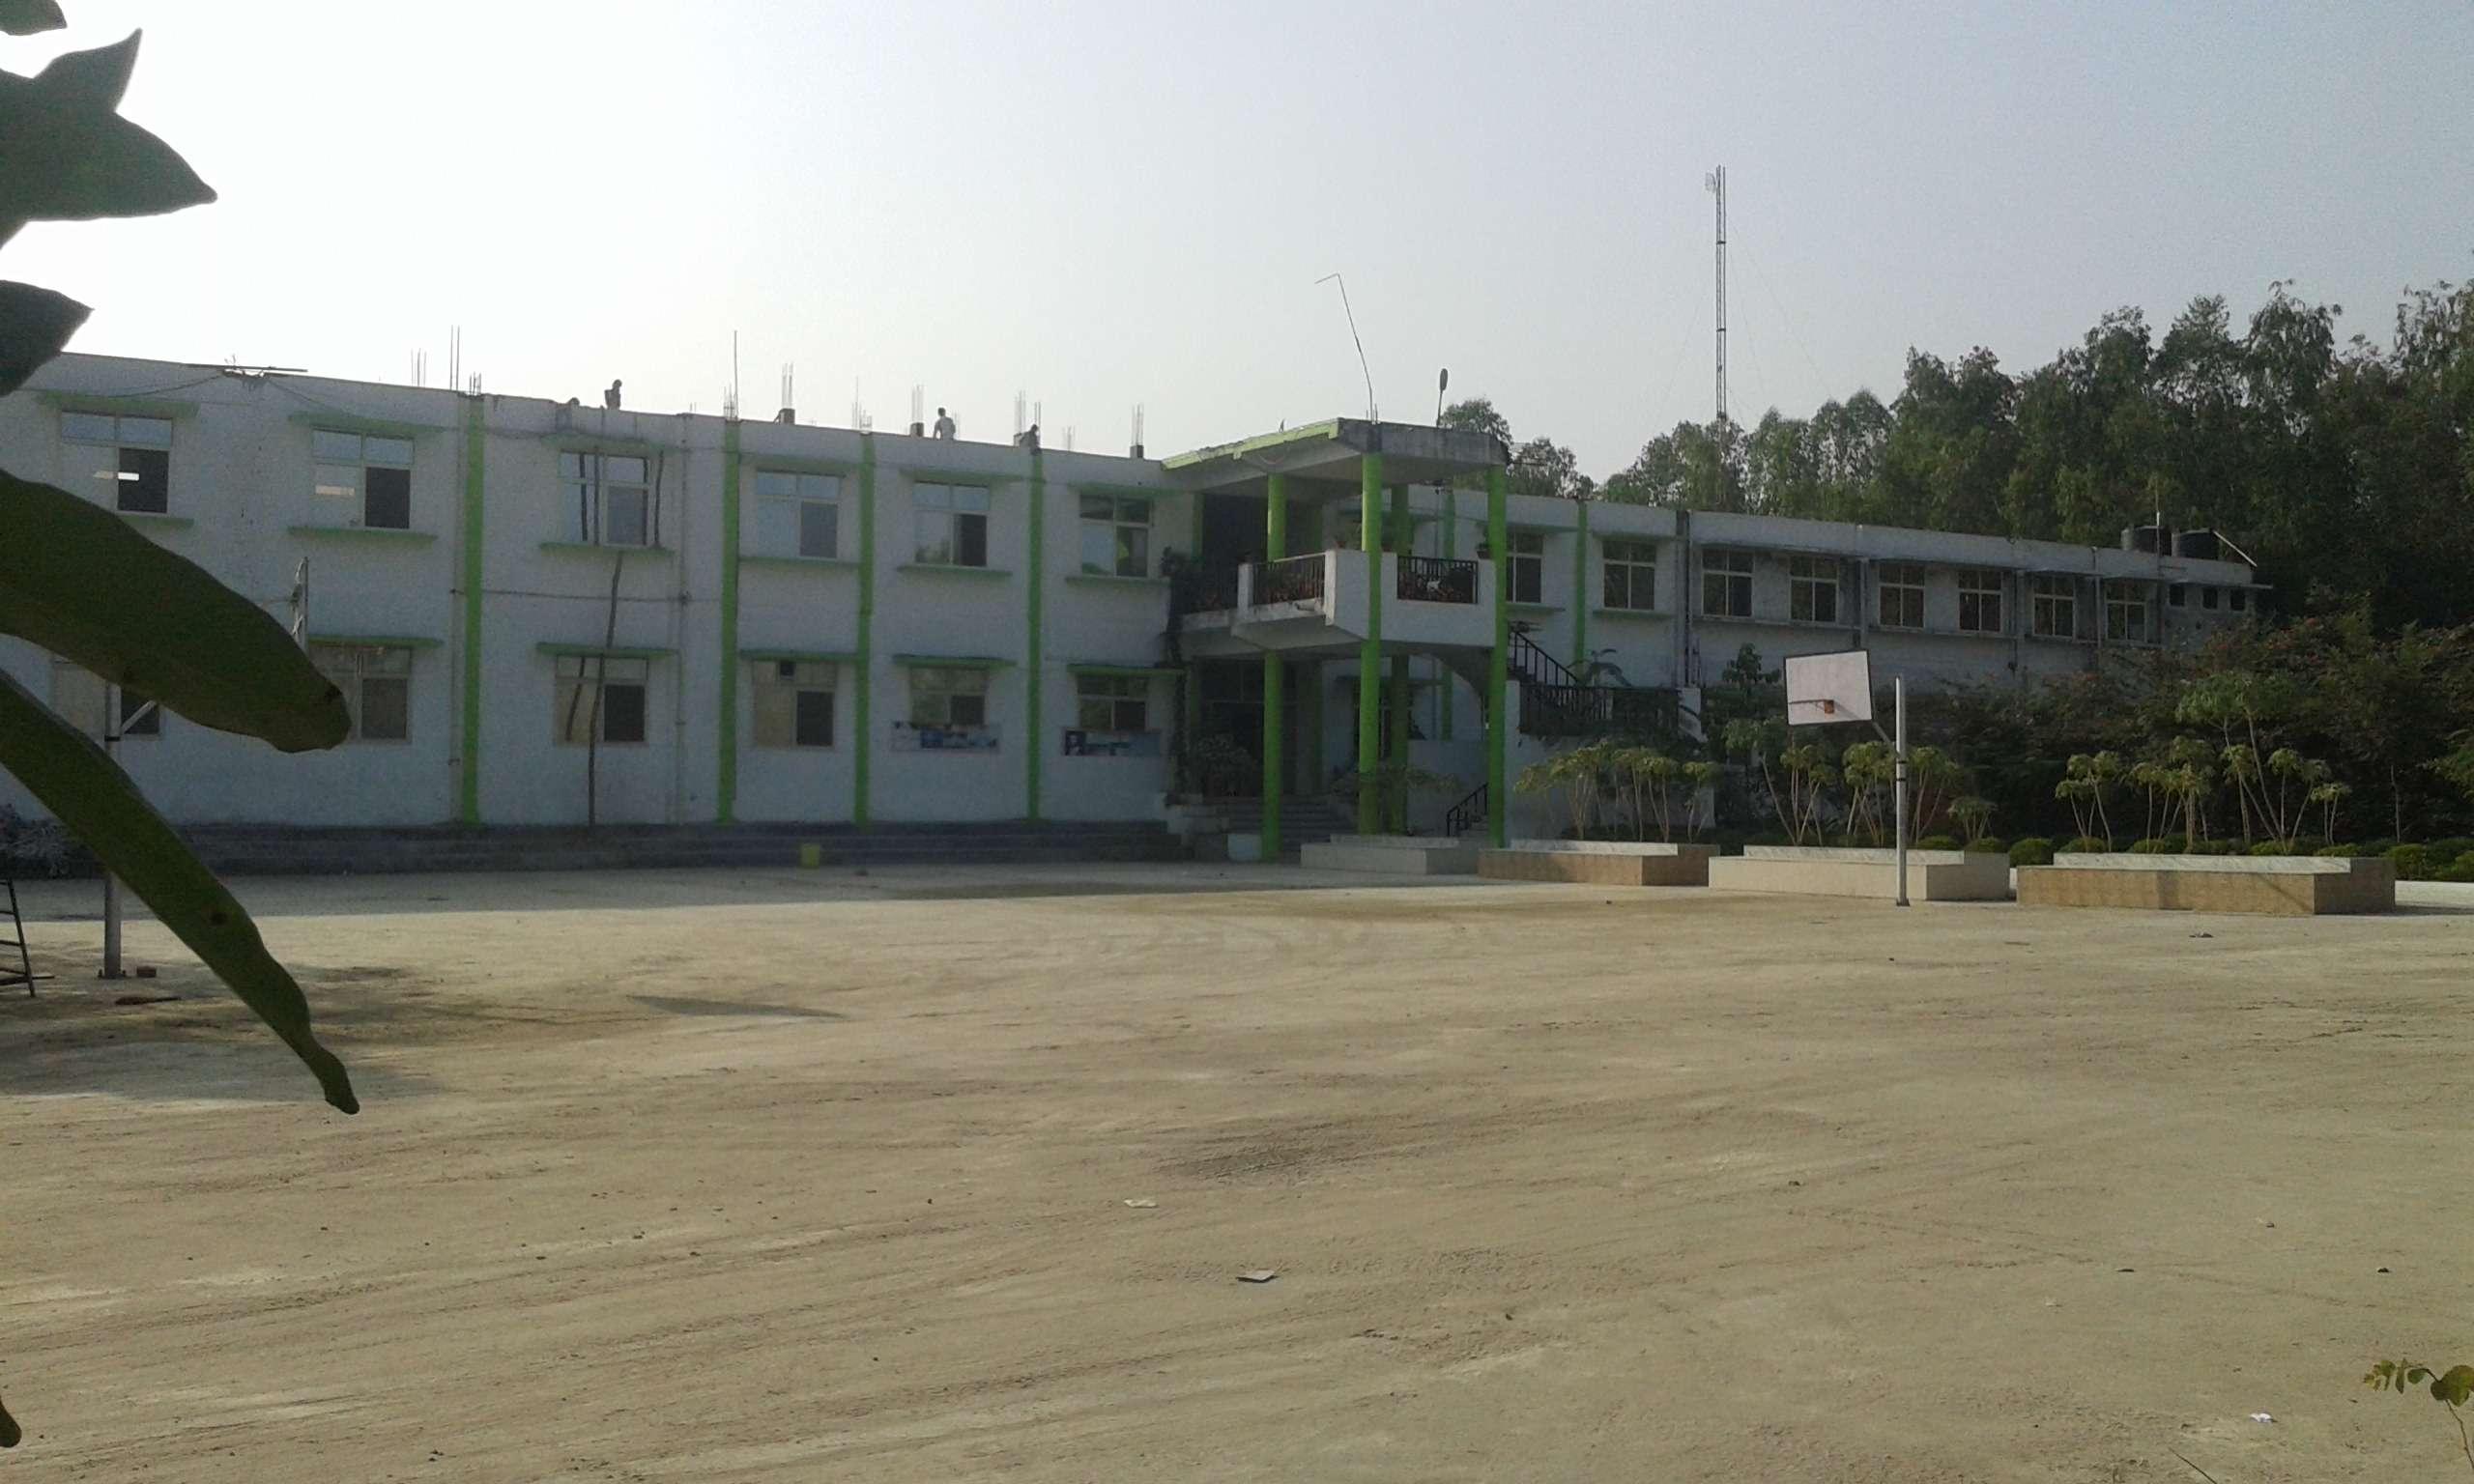 SHEMFORD SCHOOL HARIDWAR uttarakhand 3530380